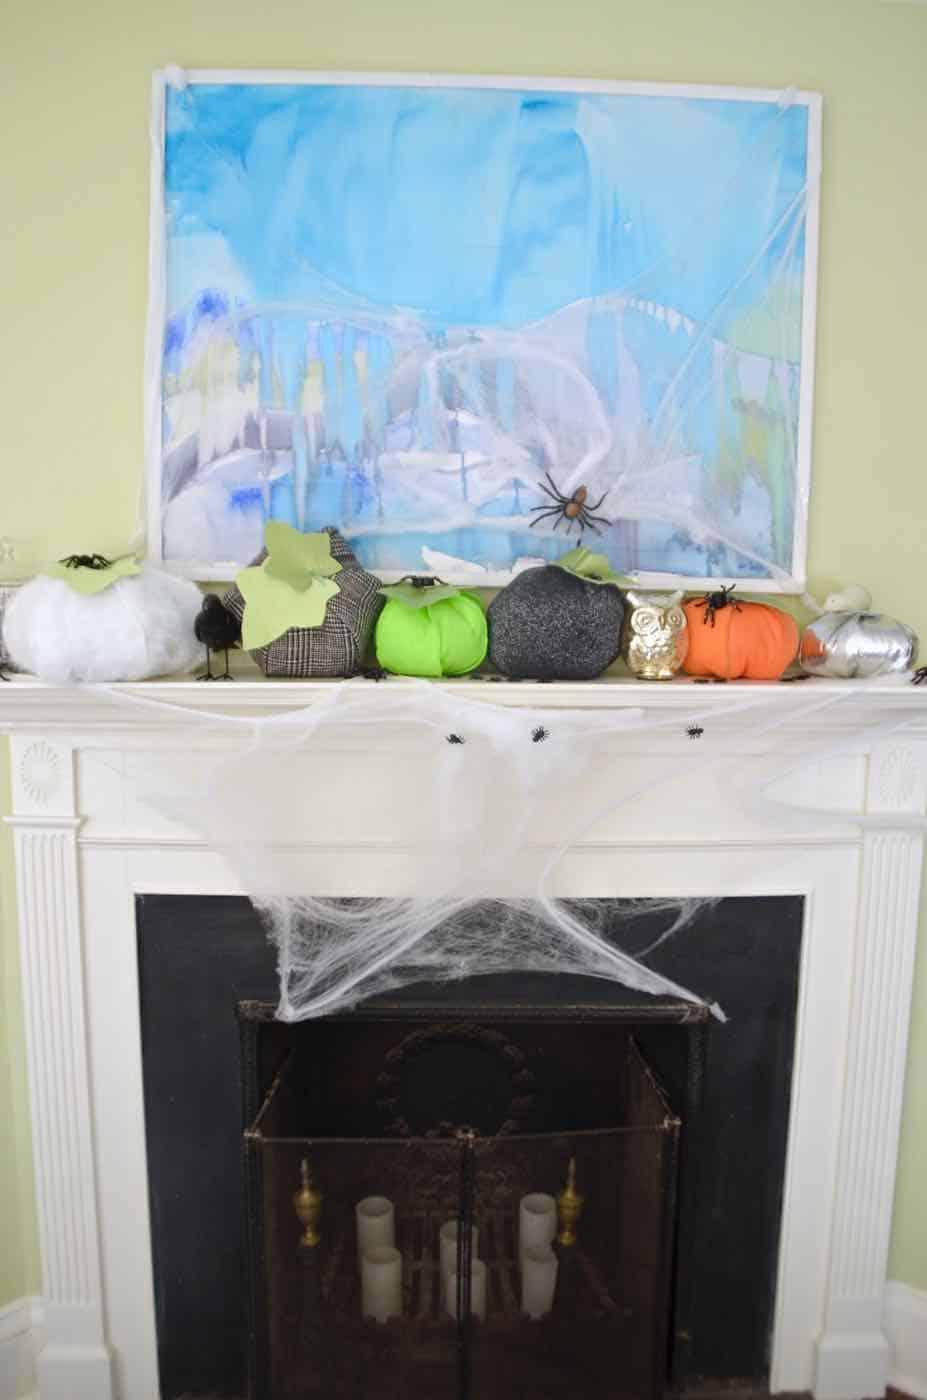 Stuffed pumpkins made from scrap fabric all ready for Halloween decor.